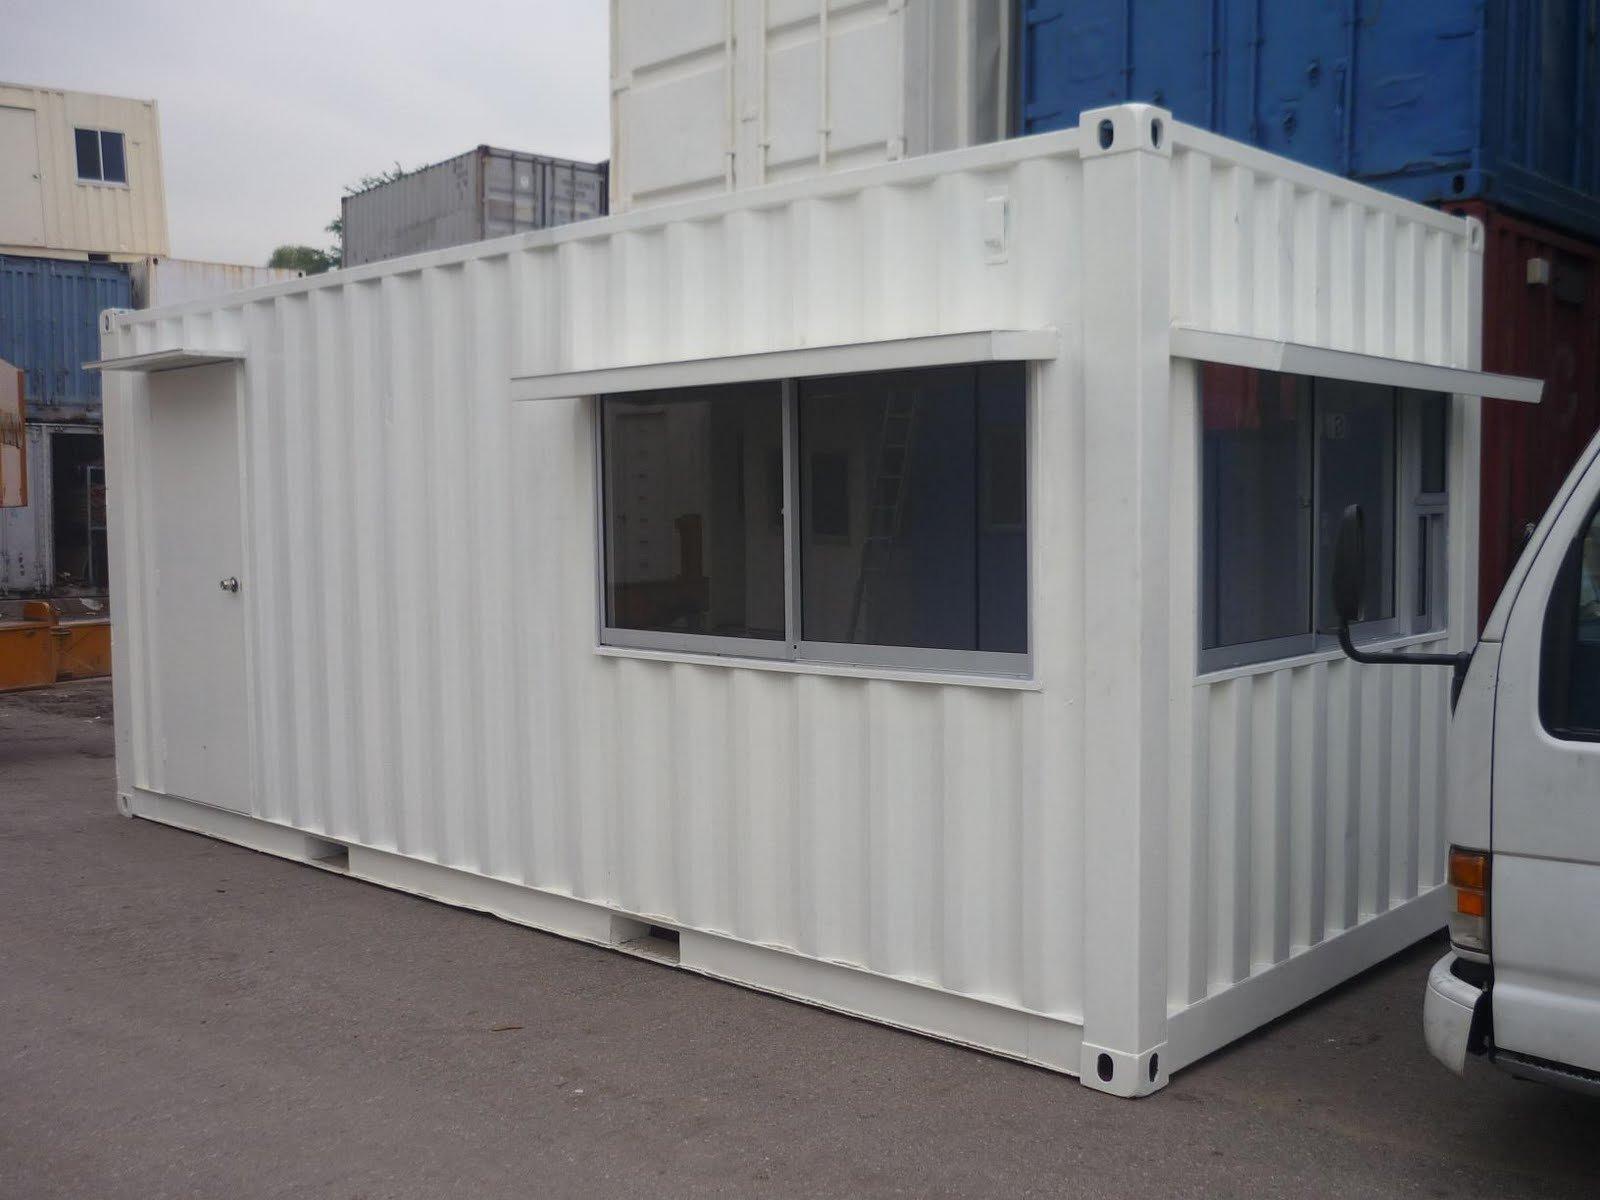 Oficina de contenedores containers identificaci n del for Container oficina